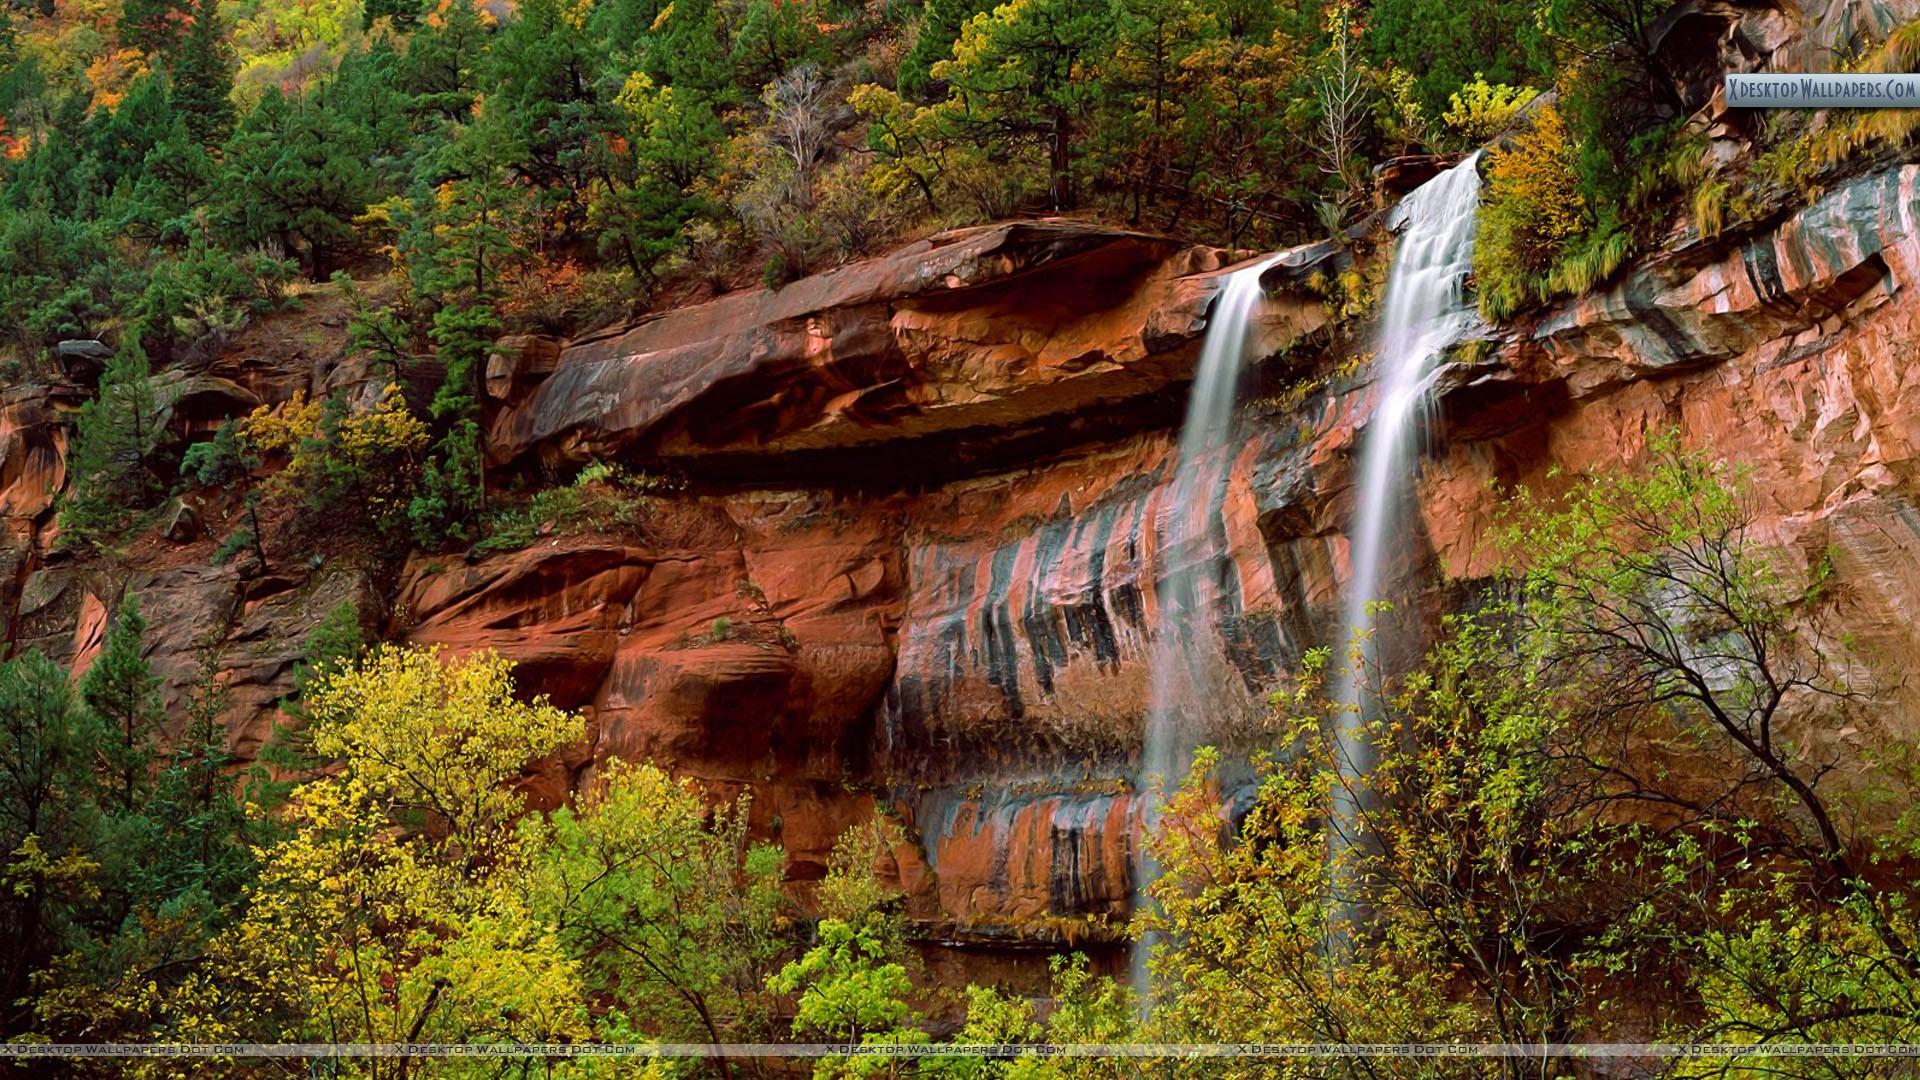 Emerald-Pools-Waterfall-Zion-National-Park-Utah